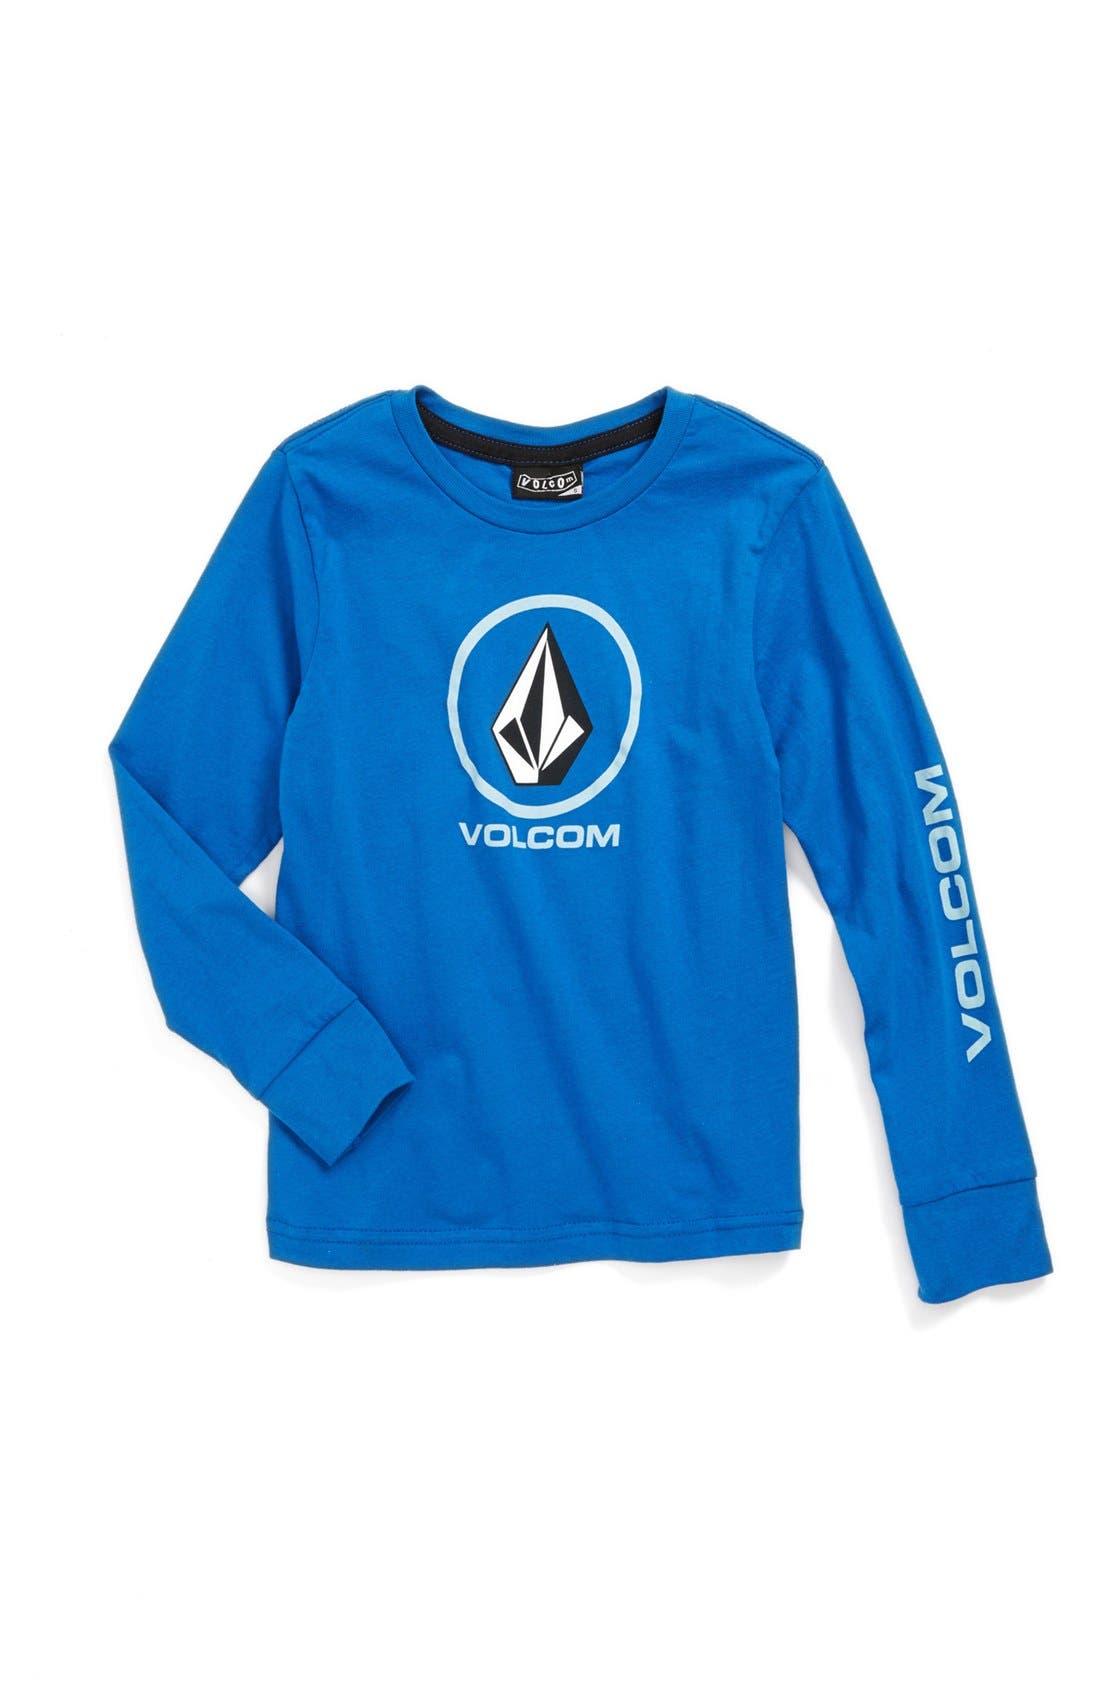 Alternate Image 1 Selected - Volcom 'Circle Staple' Long Sleeve T-Shirt (Big Boys)